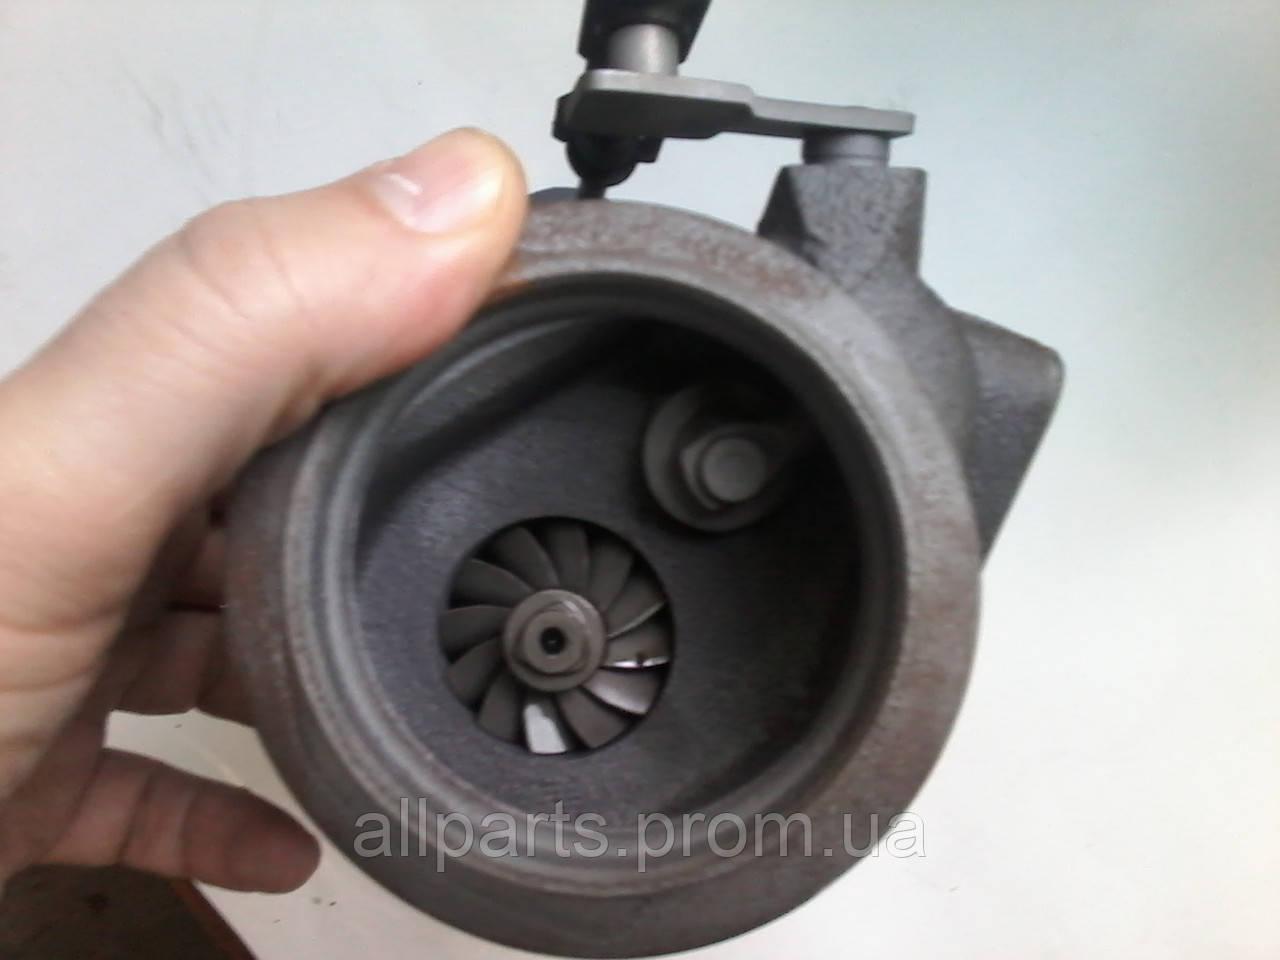 Турбина Hyundai Santa Fe 2.0CRDI  00- OE: 28231-27000 , б/у реставрированная